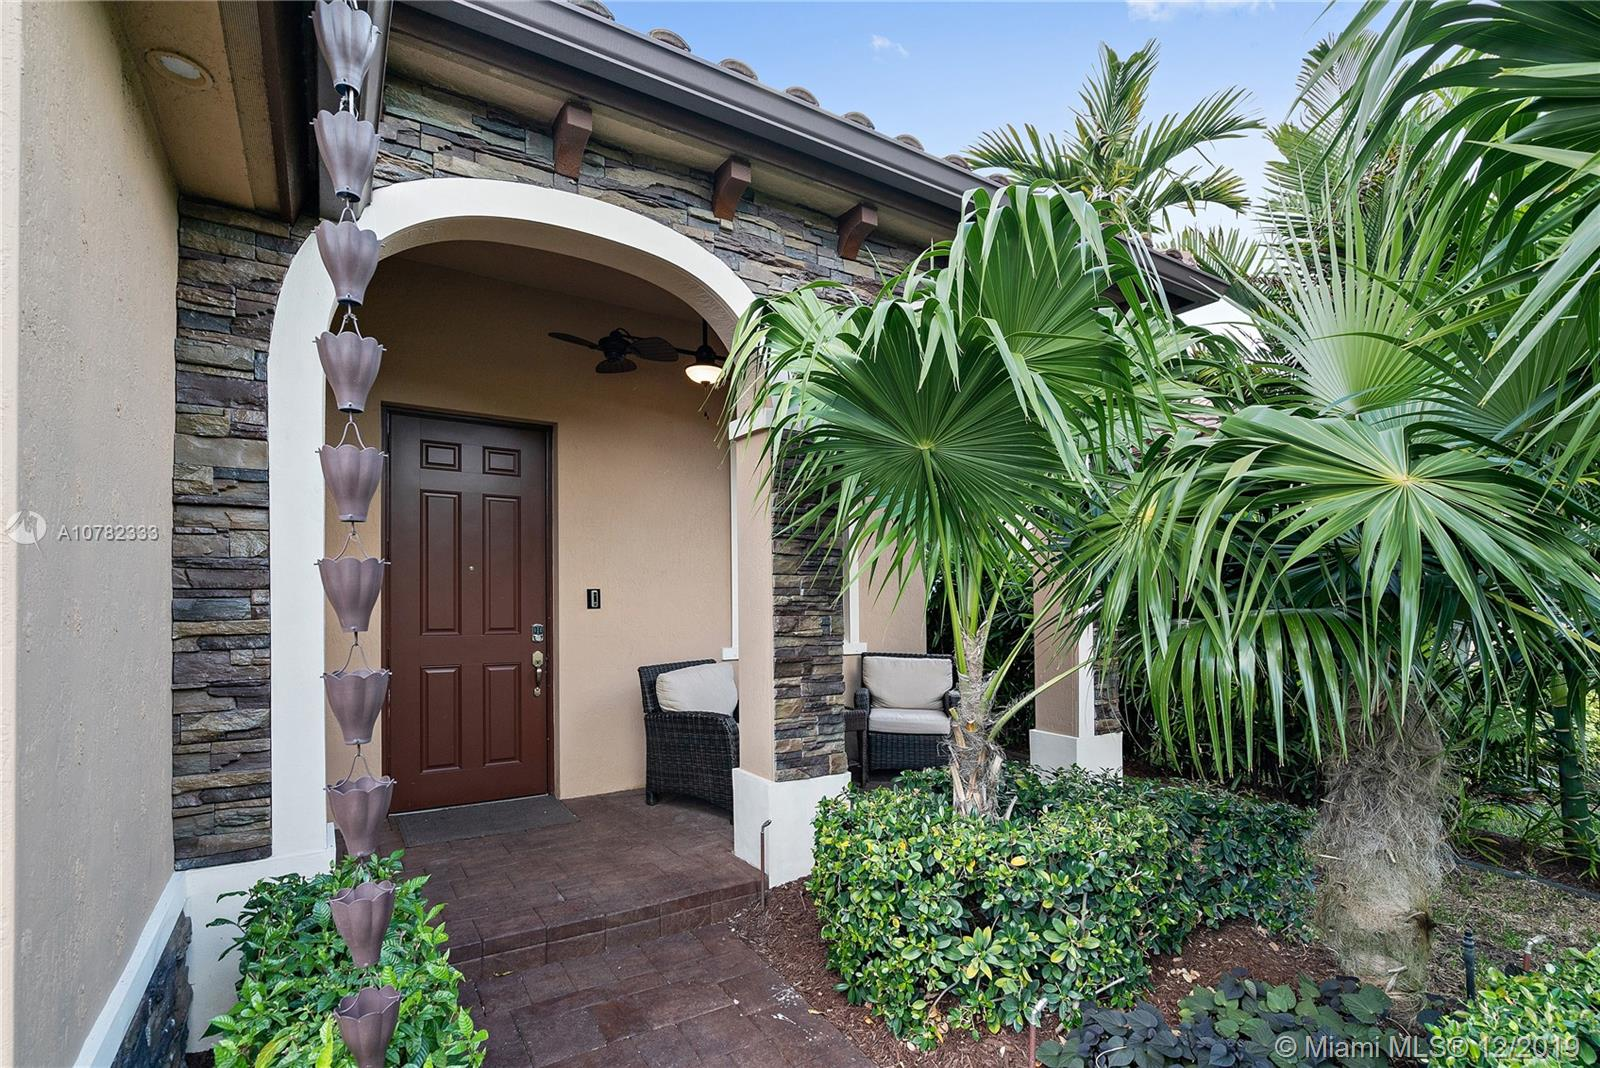 564 SE 35 Terrace, Homestead, FL 33033